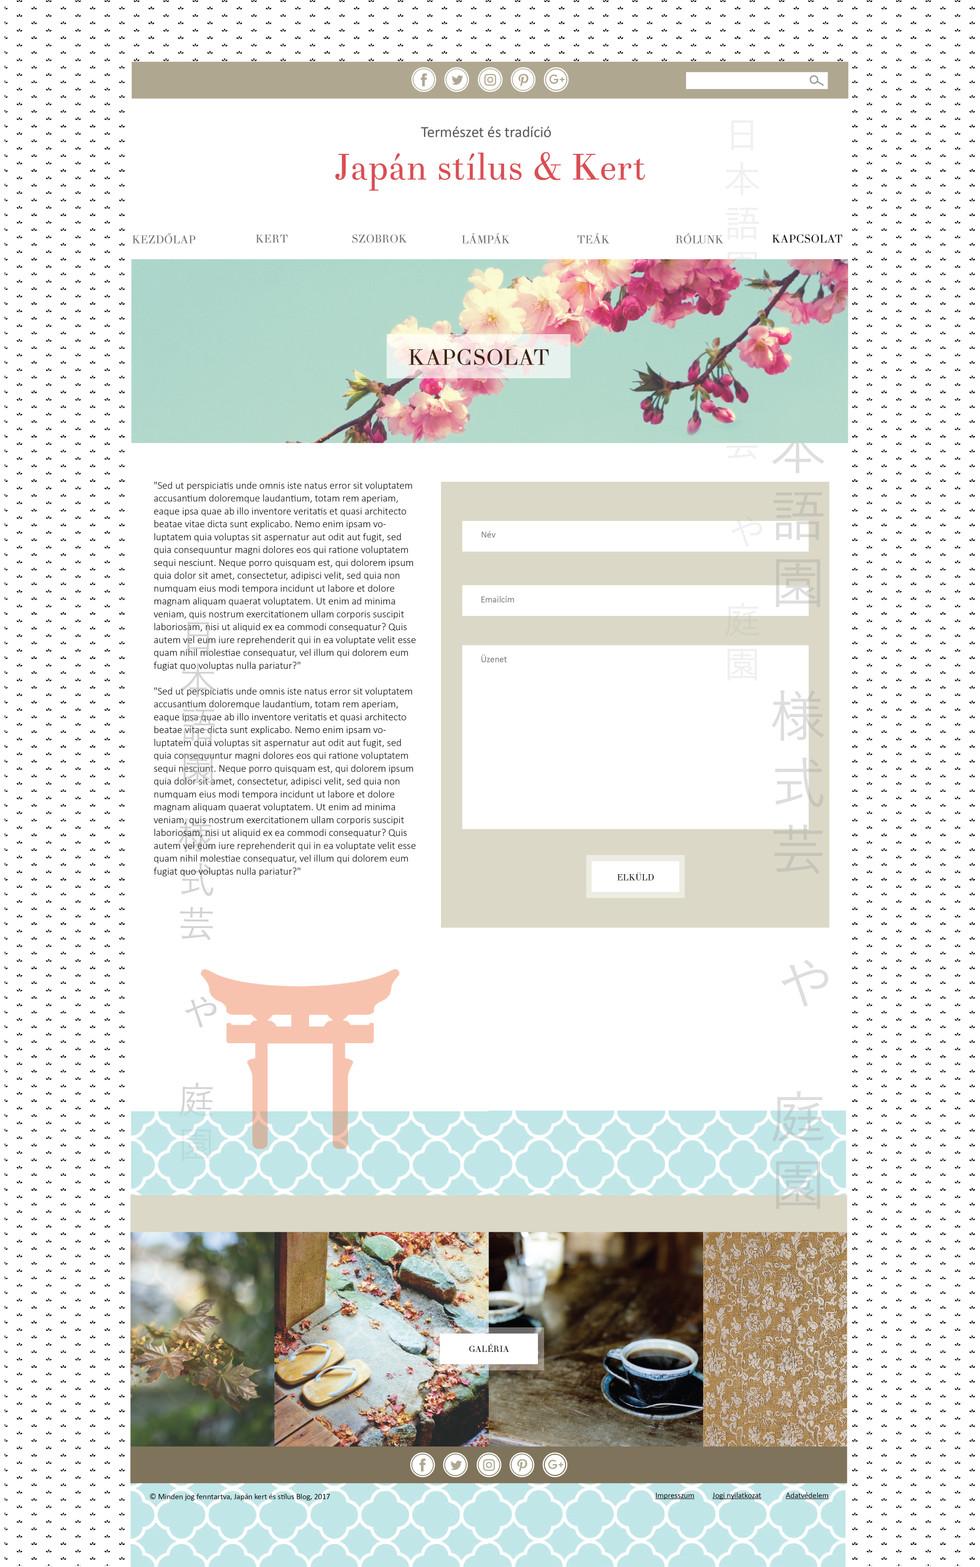 webgrafika4_3vaz-01-01-01.jpg